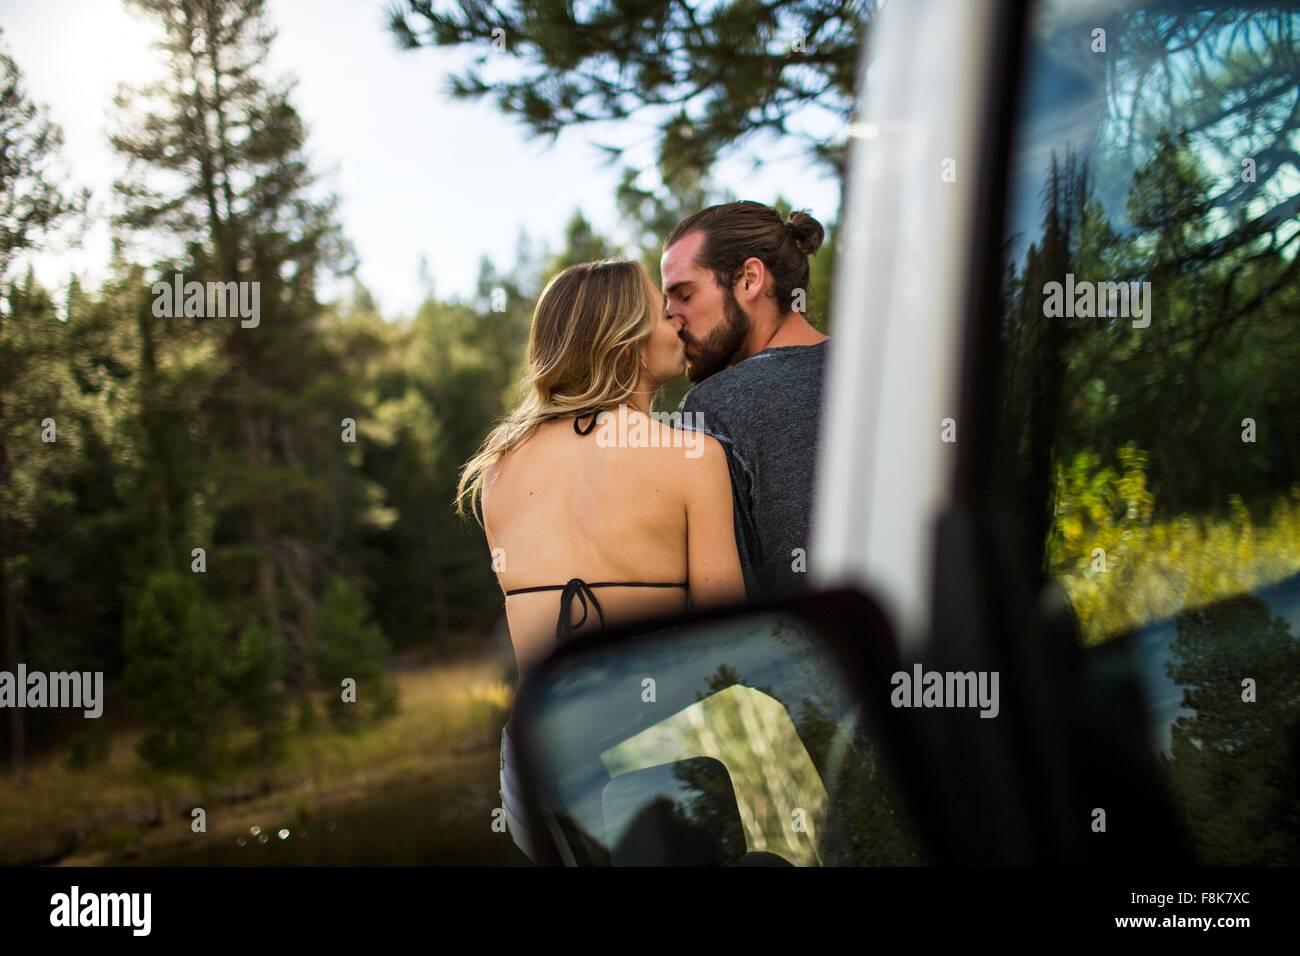 Rear view of romantic young couple kissing at riverside, Lake Tahoe, Nevada, USA - Stock Image